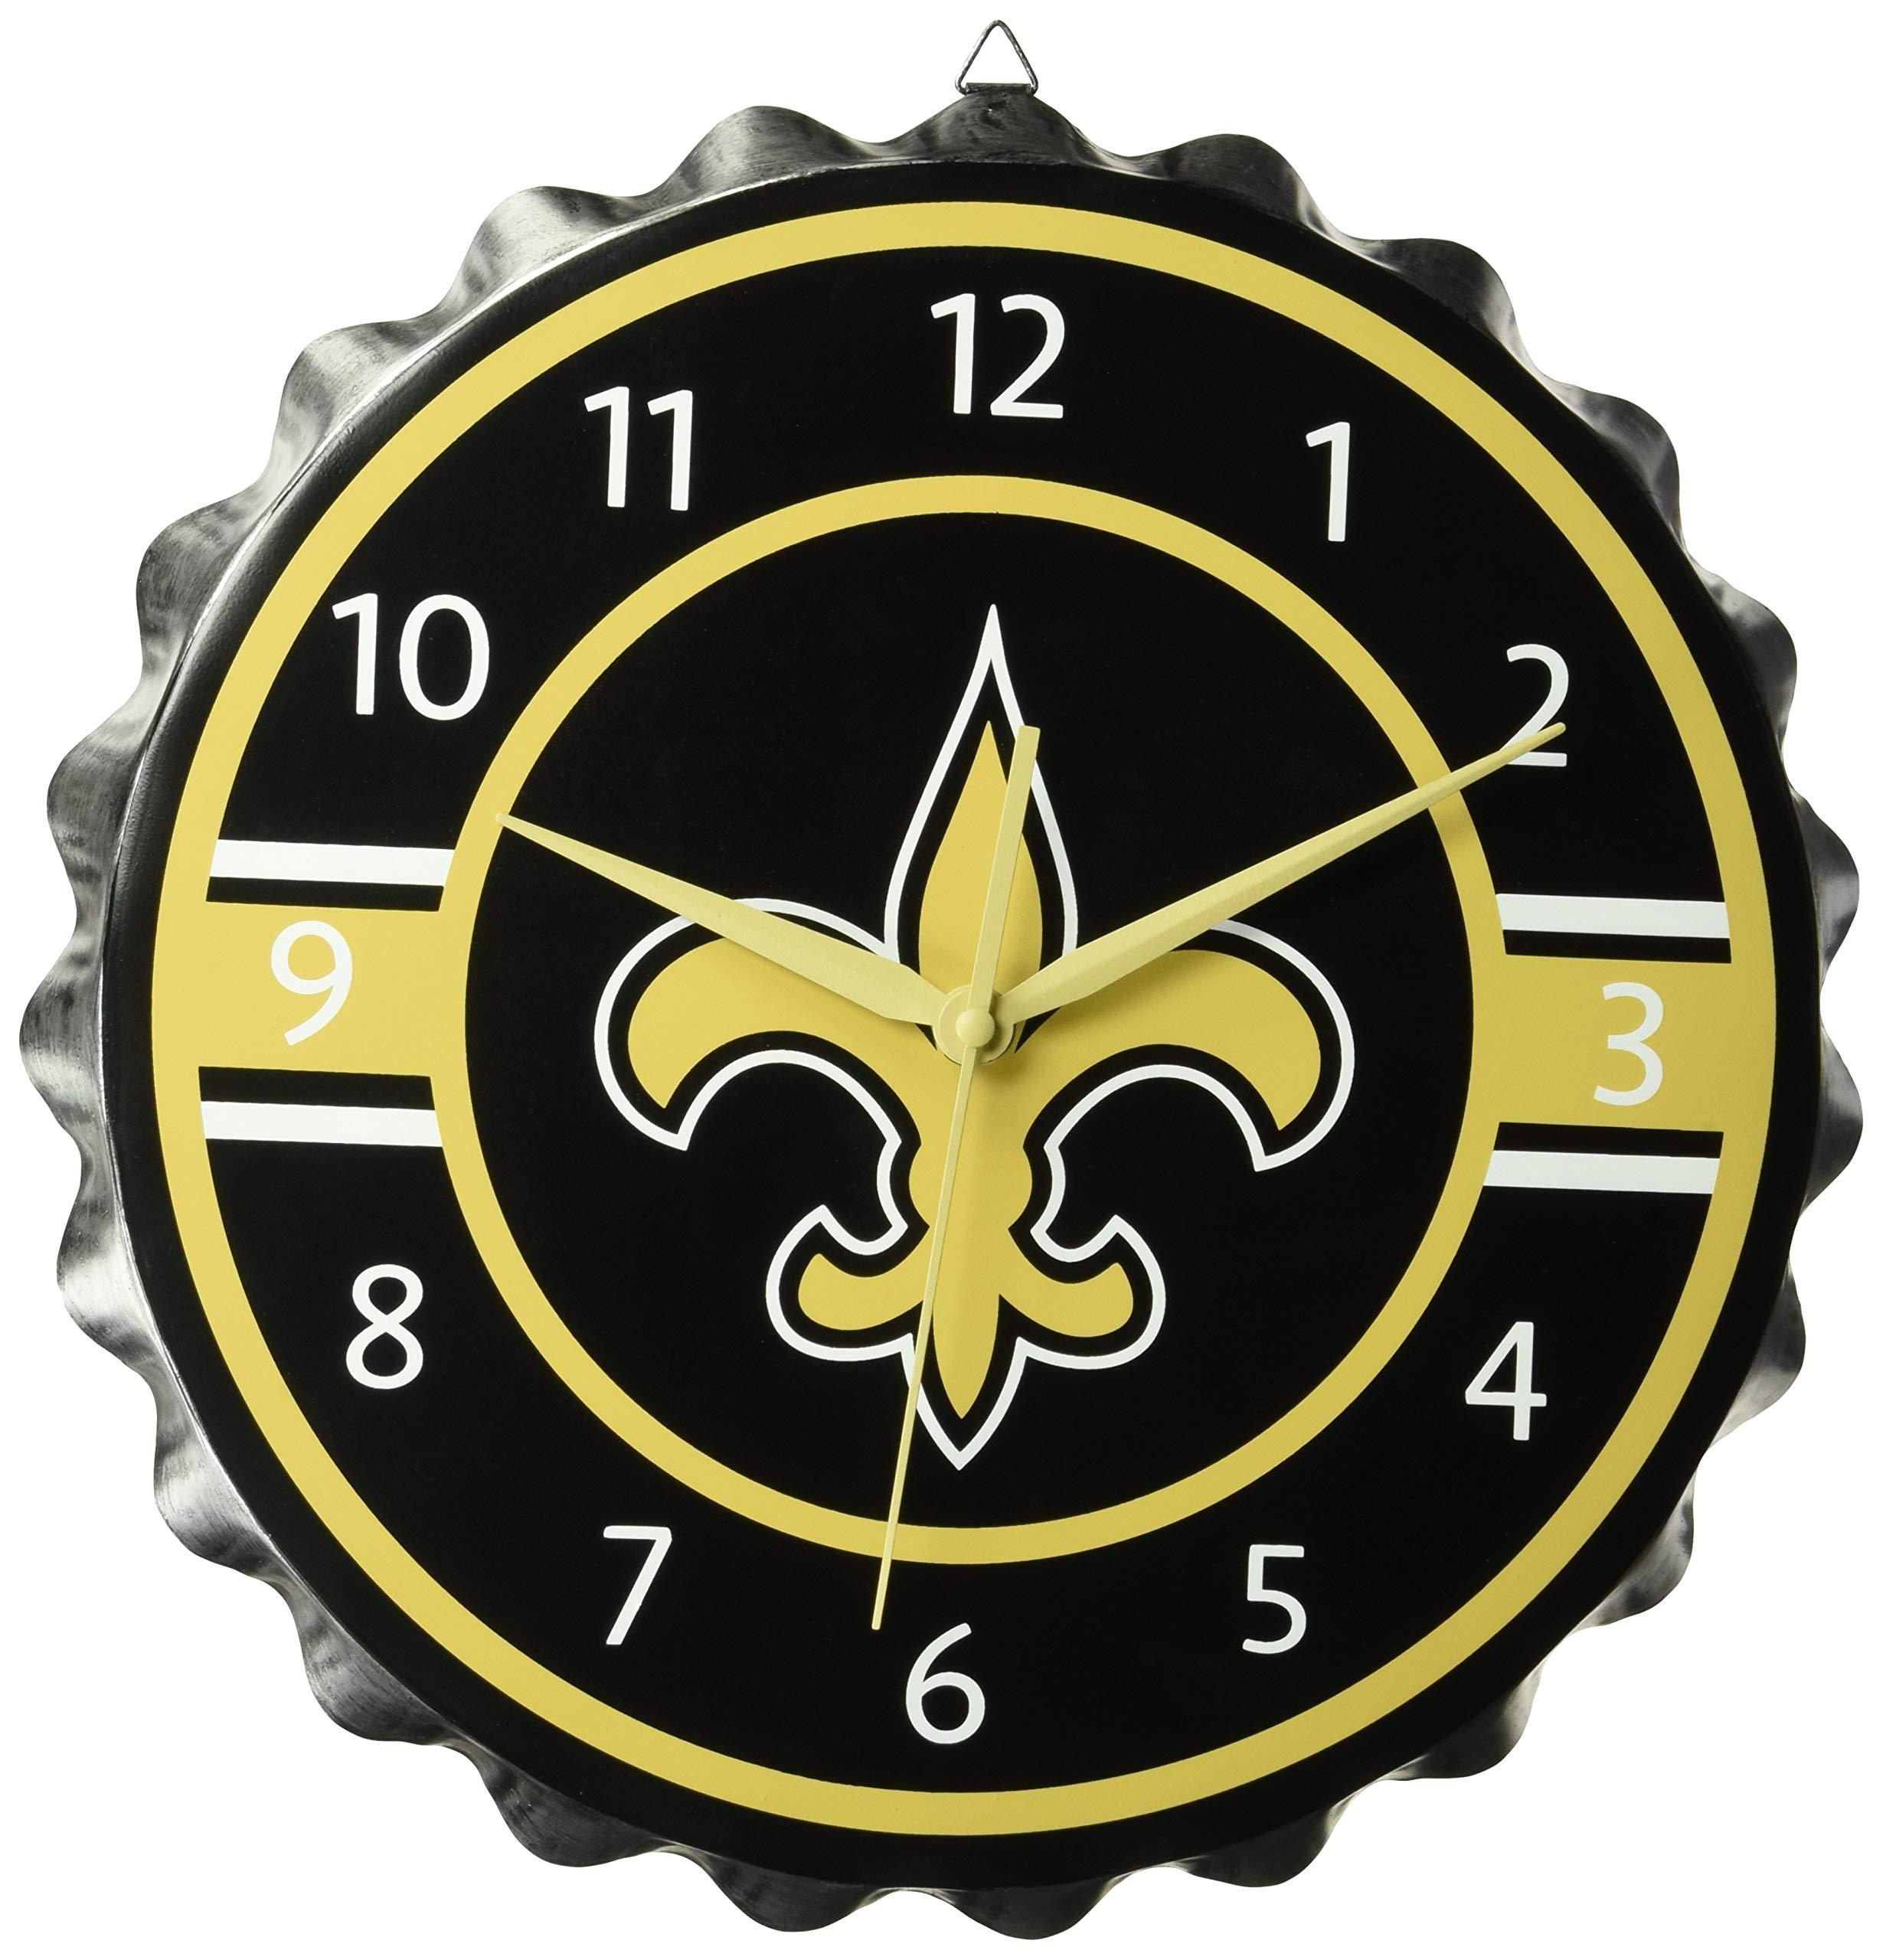 New Orleans Saints Bottlecap Clock by FOCO